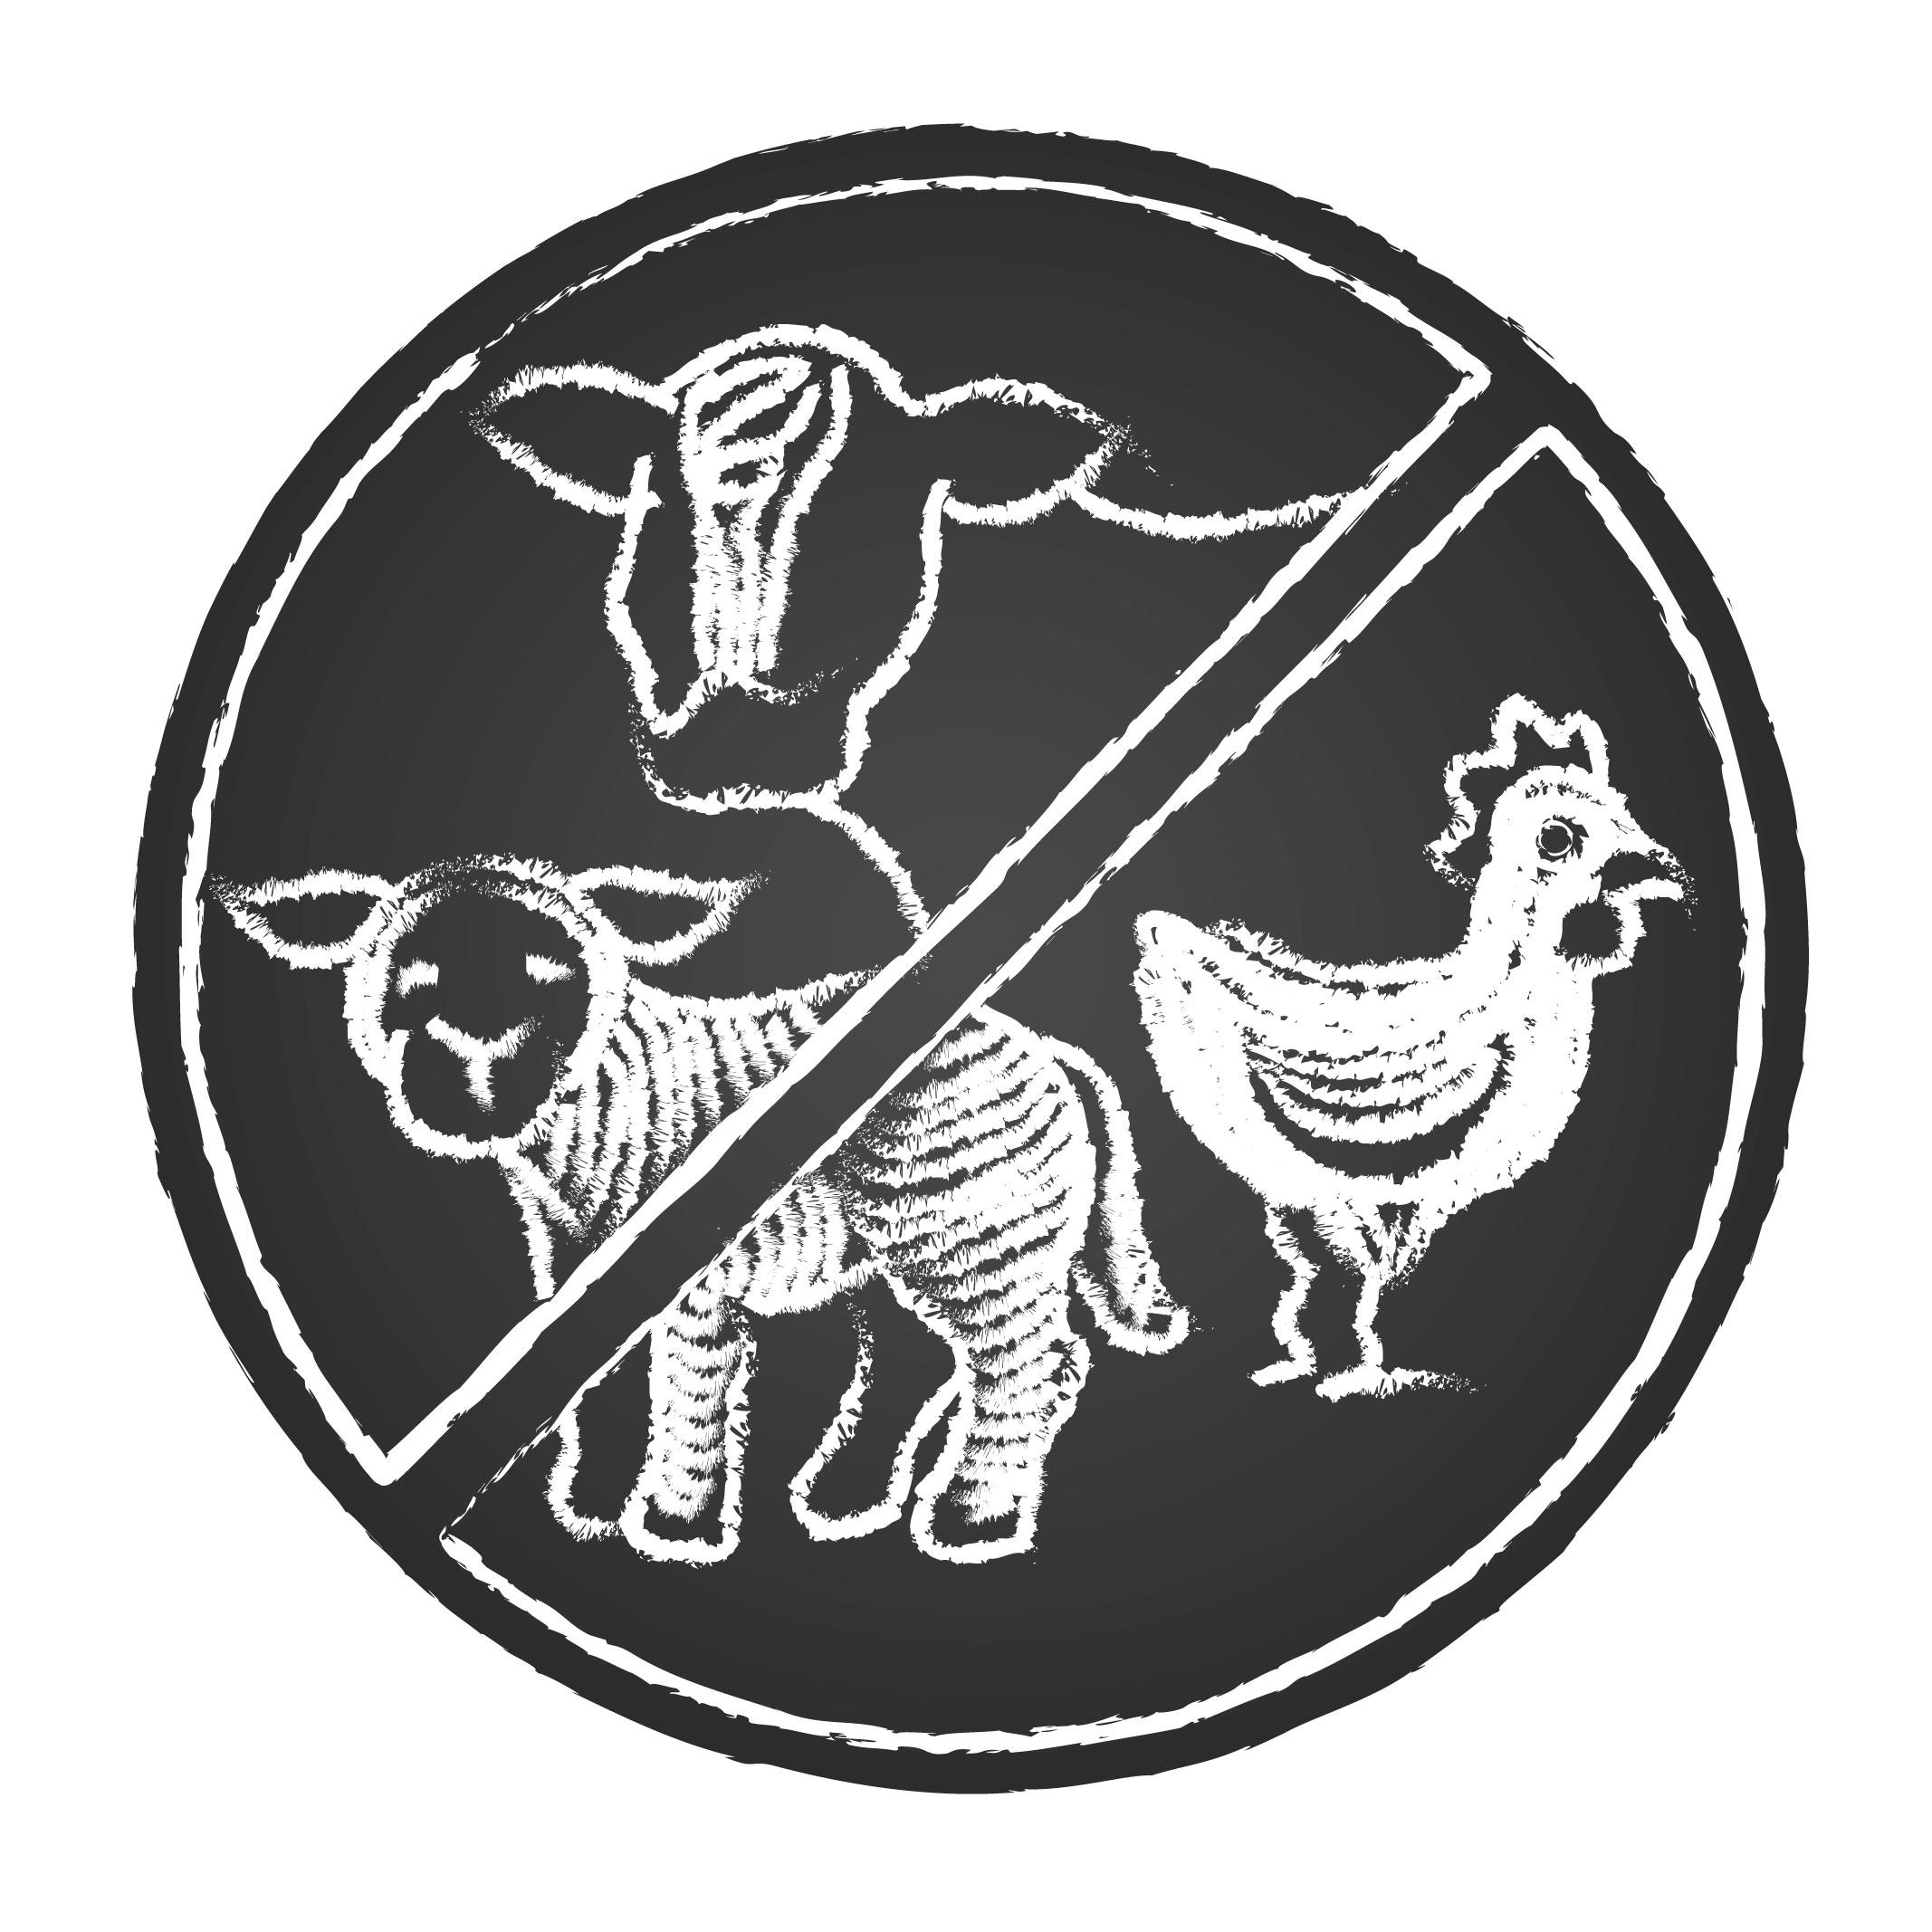 Sans protéines d'animaux terrestres